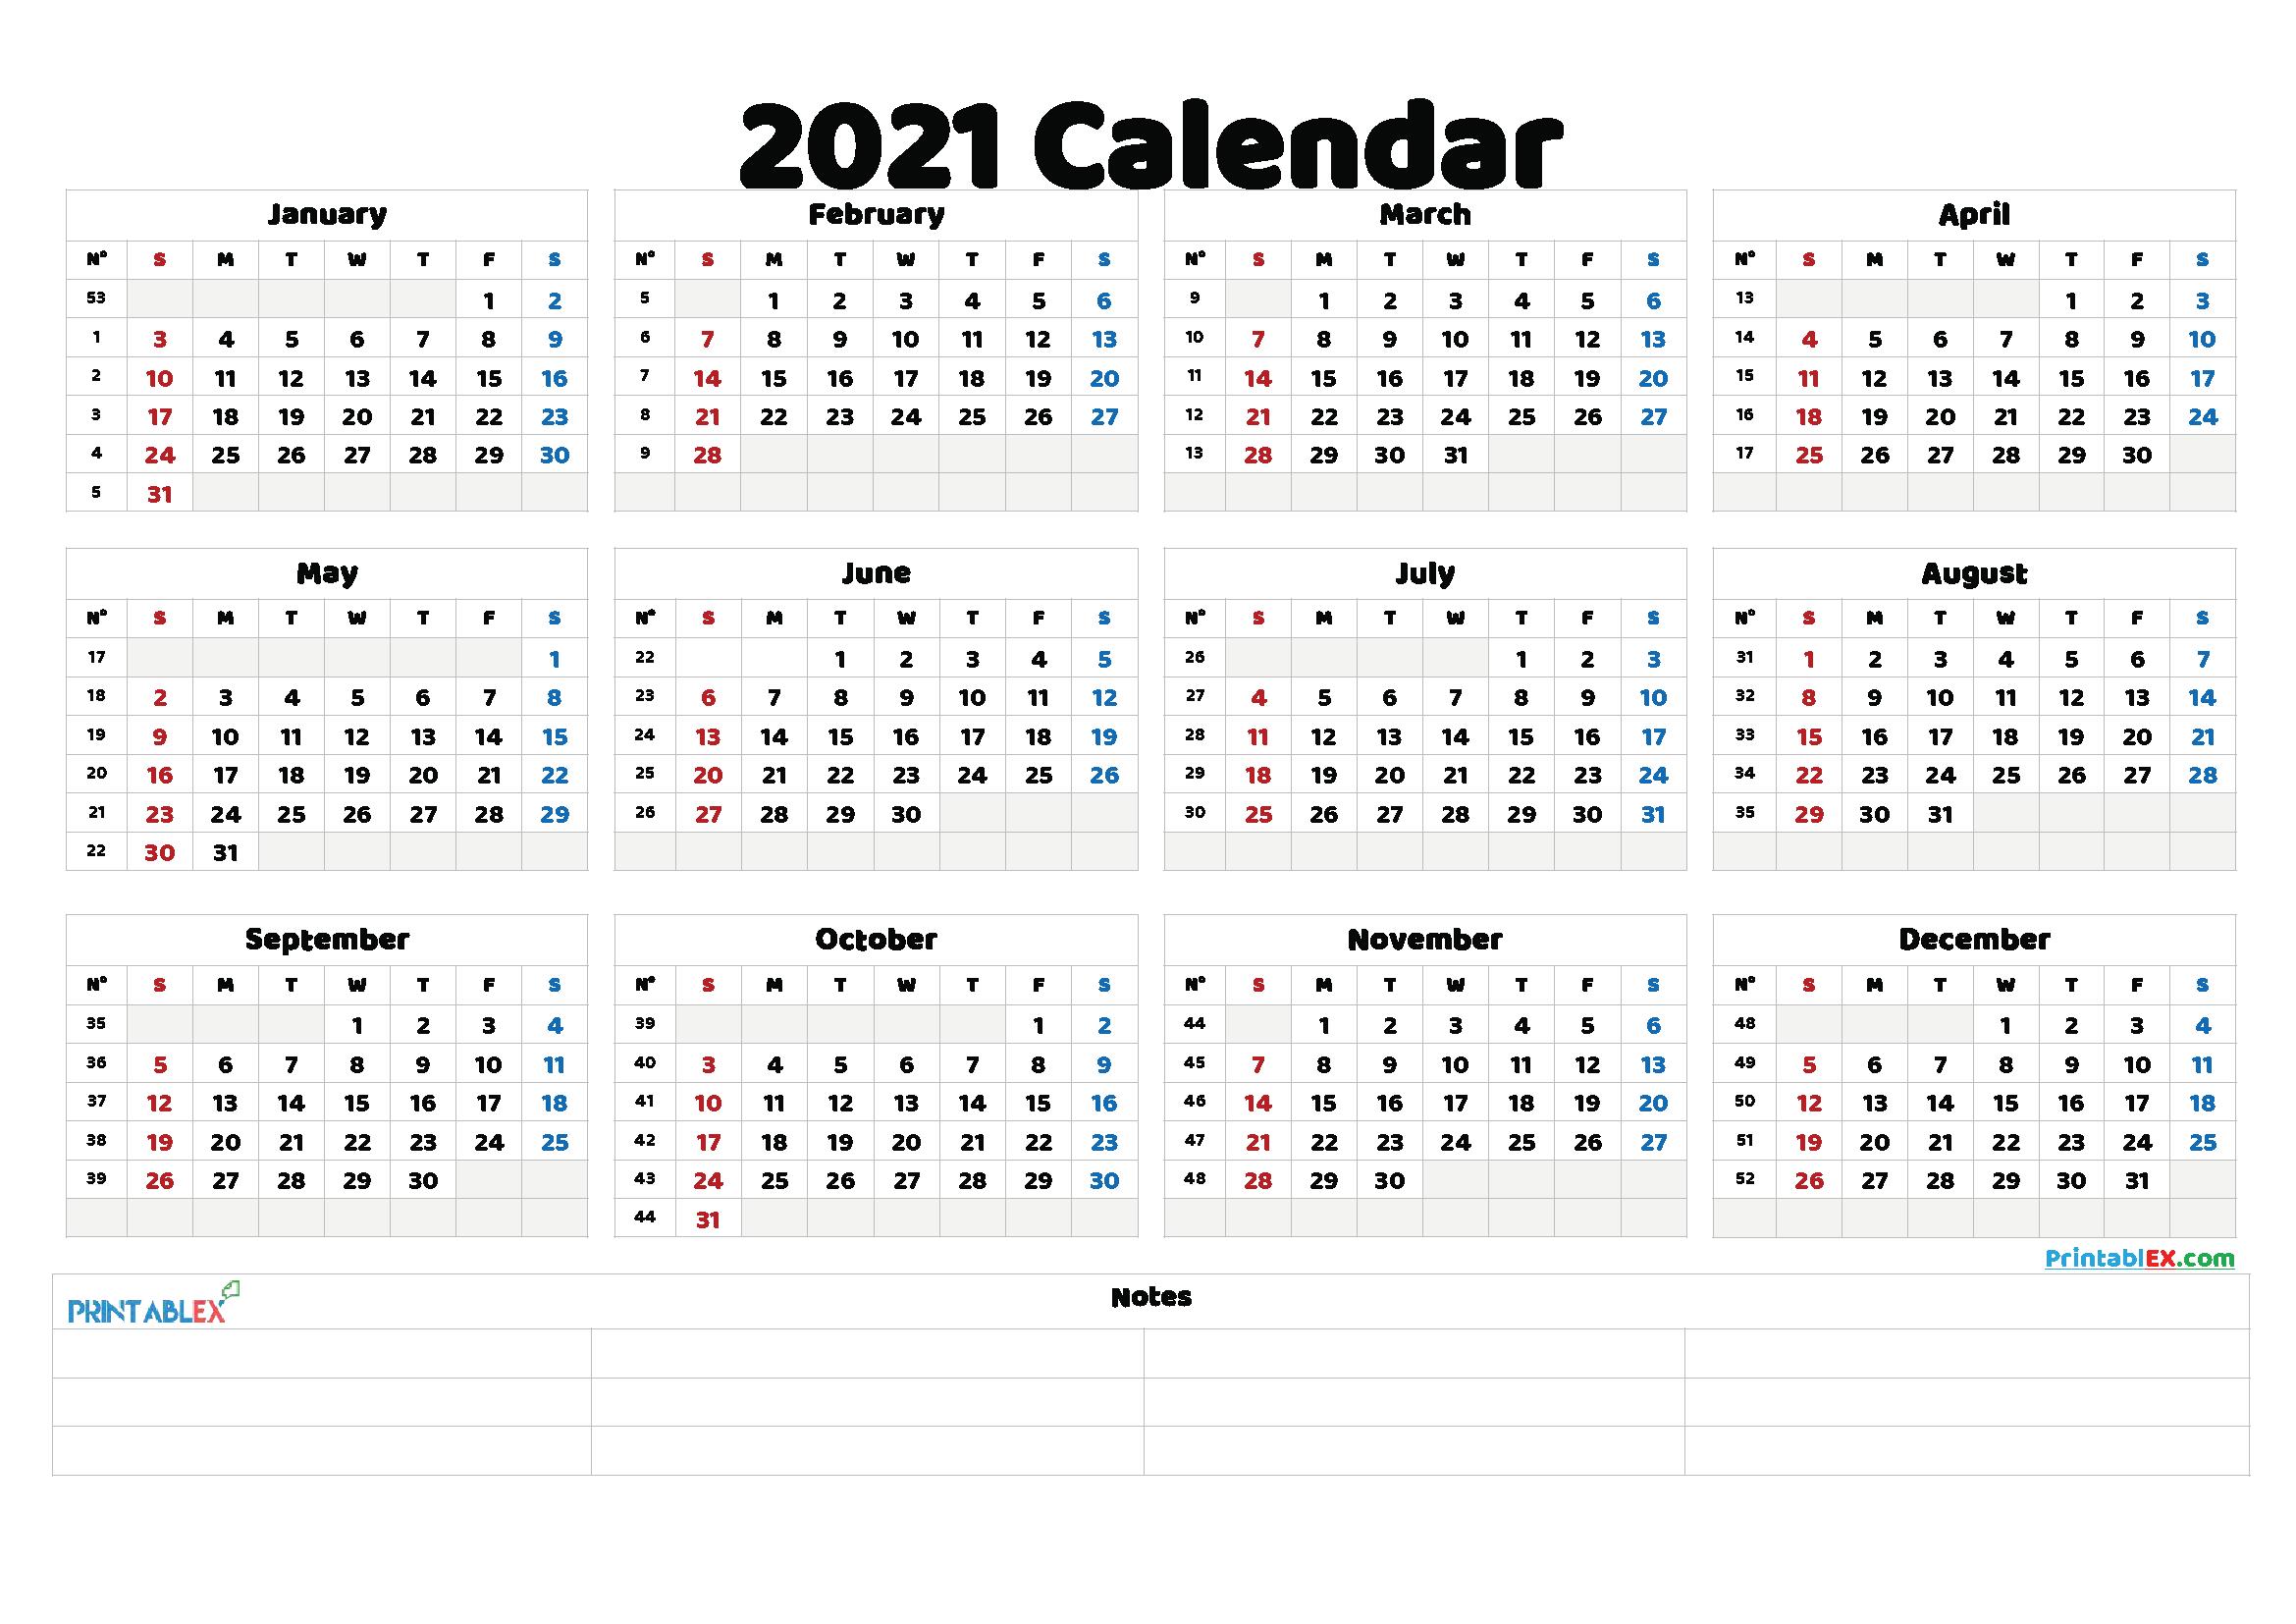 Free Printable 2021 Calendar With Religious Holidays   Free 2021 Printable Calendars